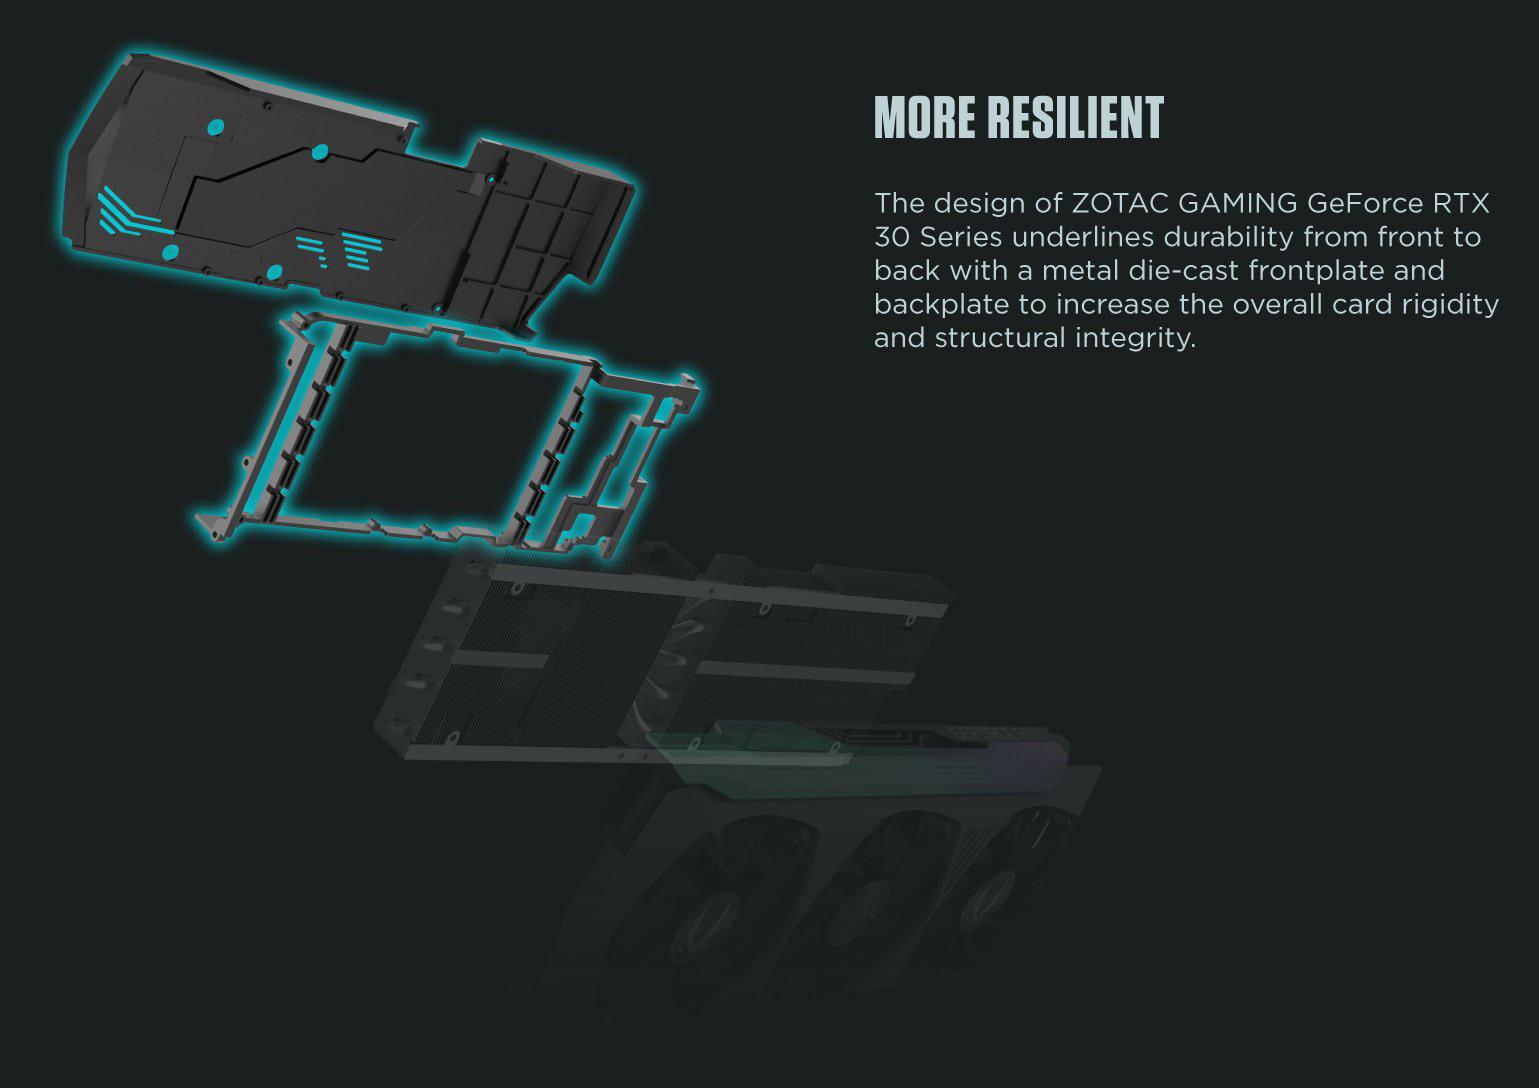 Thiết kế của ZOTAC Gaming RTX 3080 AMP Holo